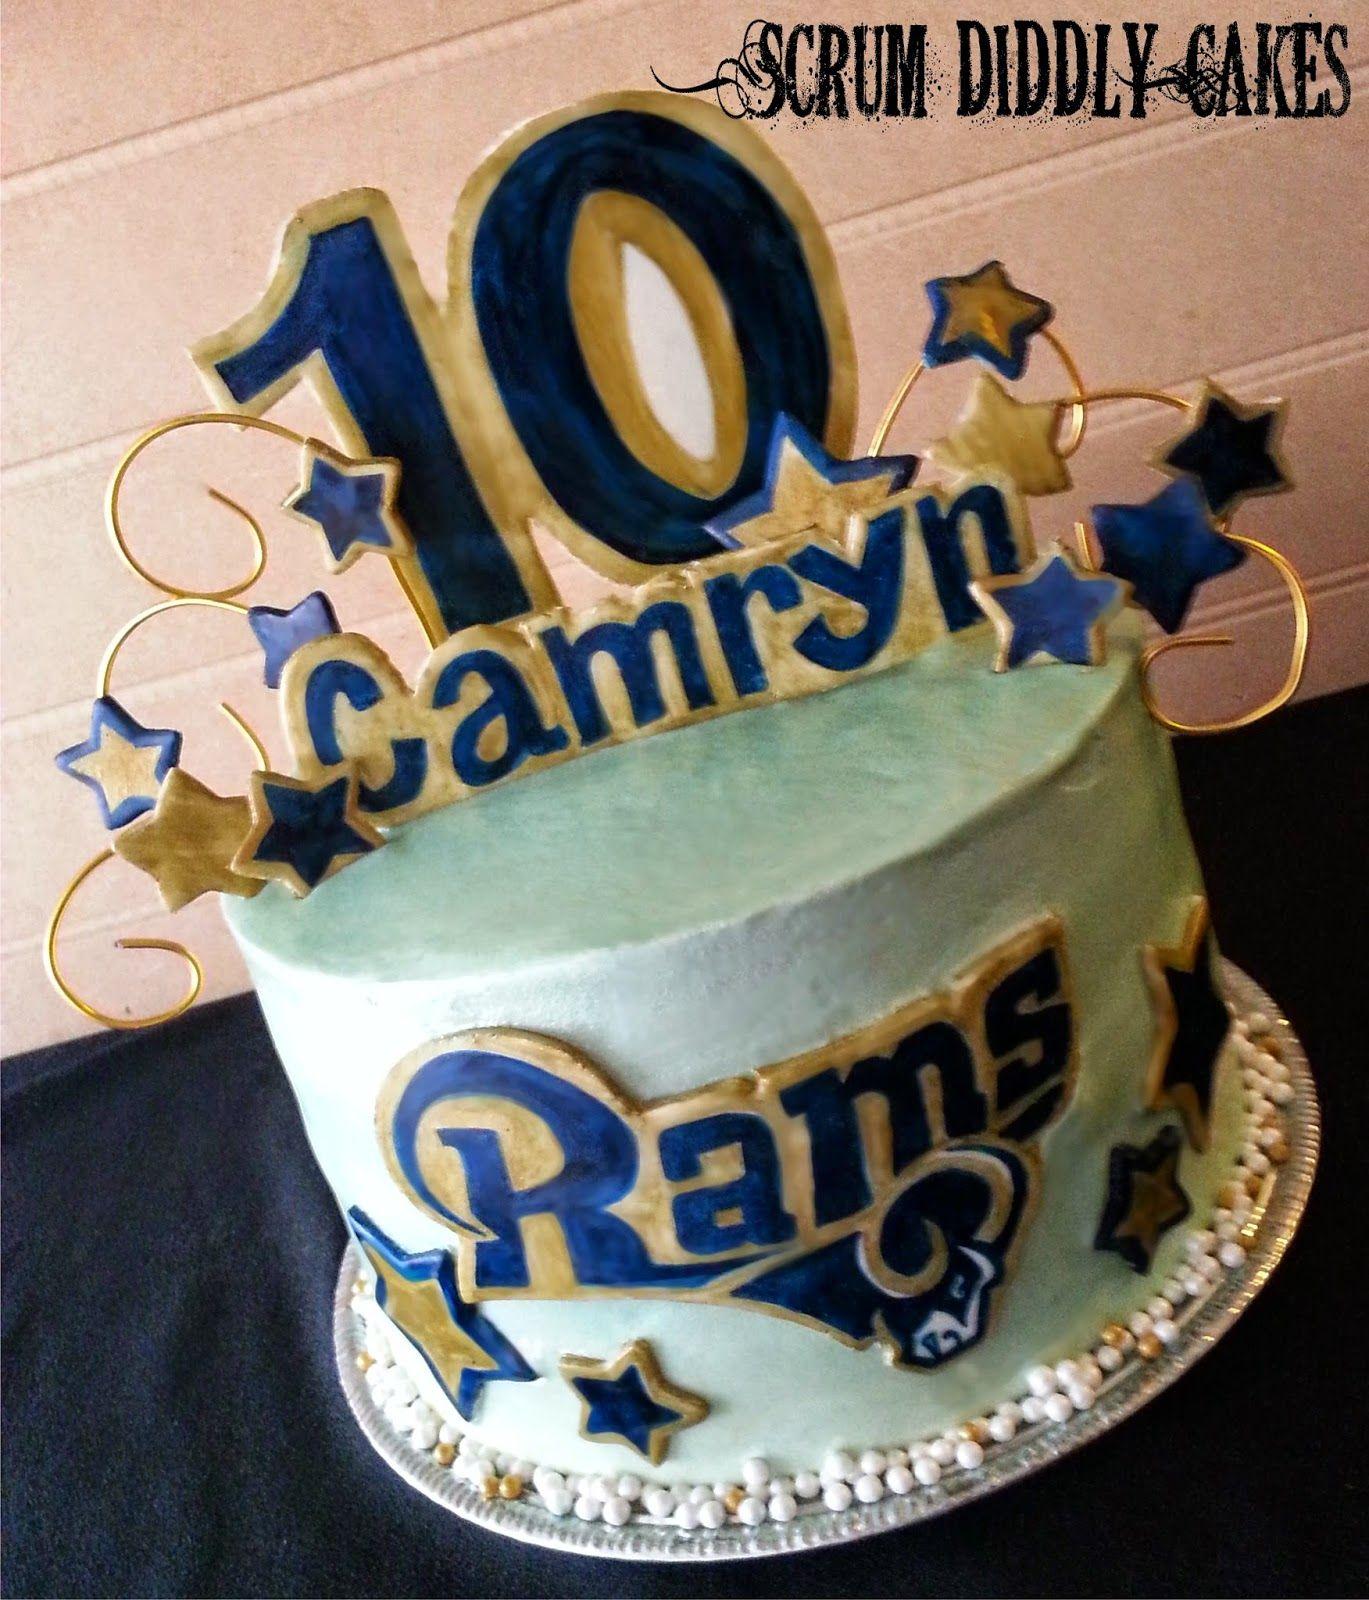 Enjoyable Scrum Diddly Cakes St Louis Rams Birthday Nfl Cake Buttercream Funny Birthday Cards Online Alyptdamsfinfo